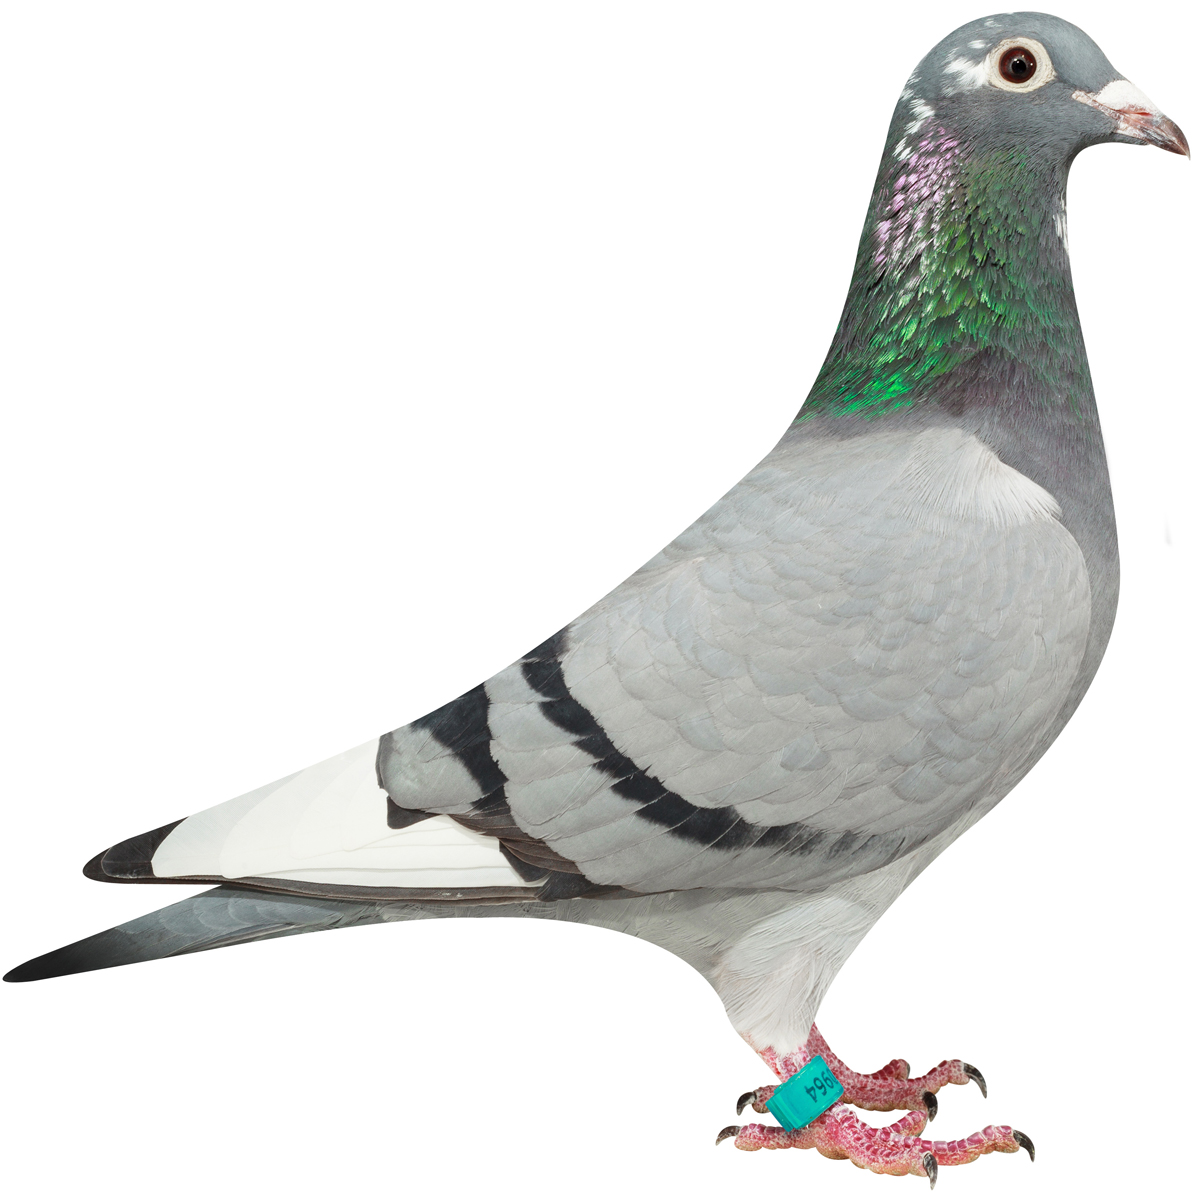 NL16-1310964